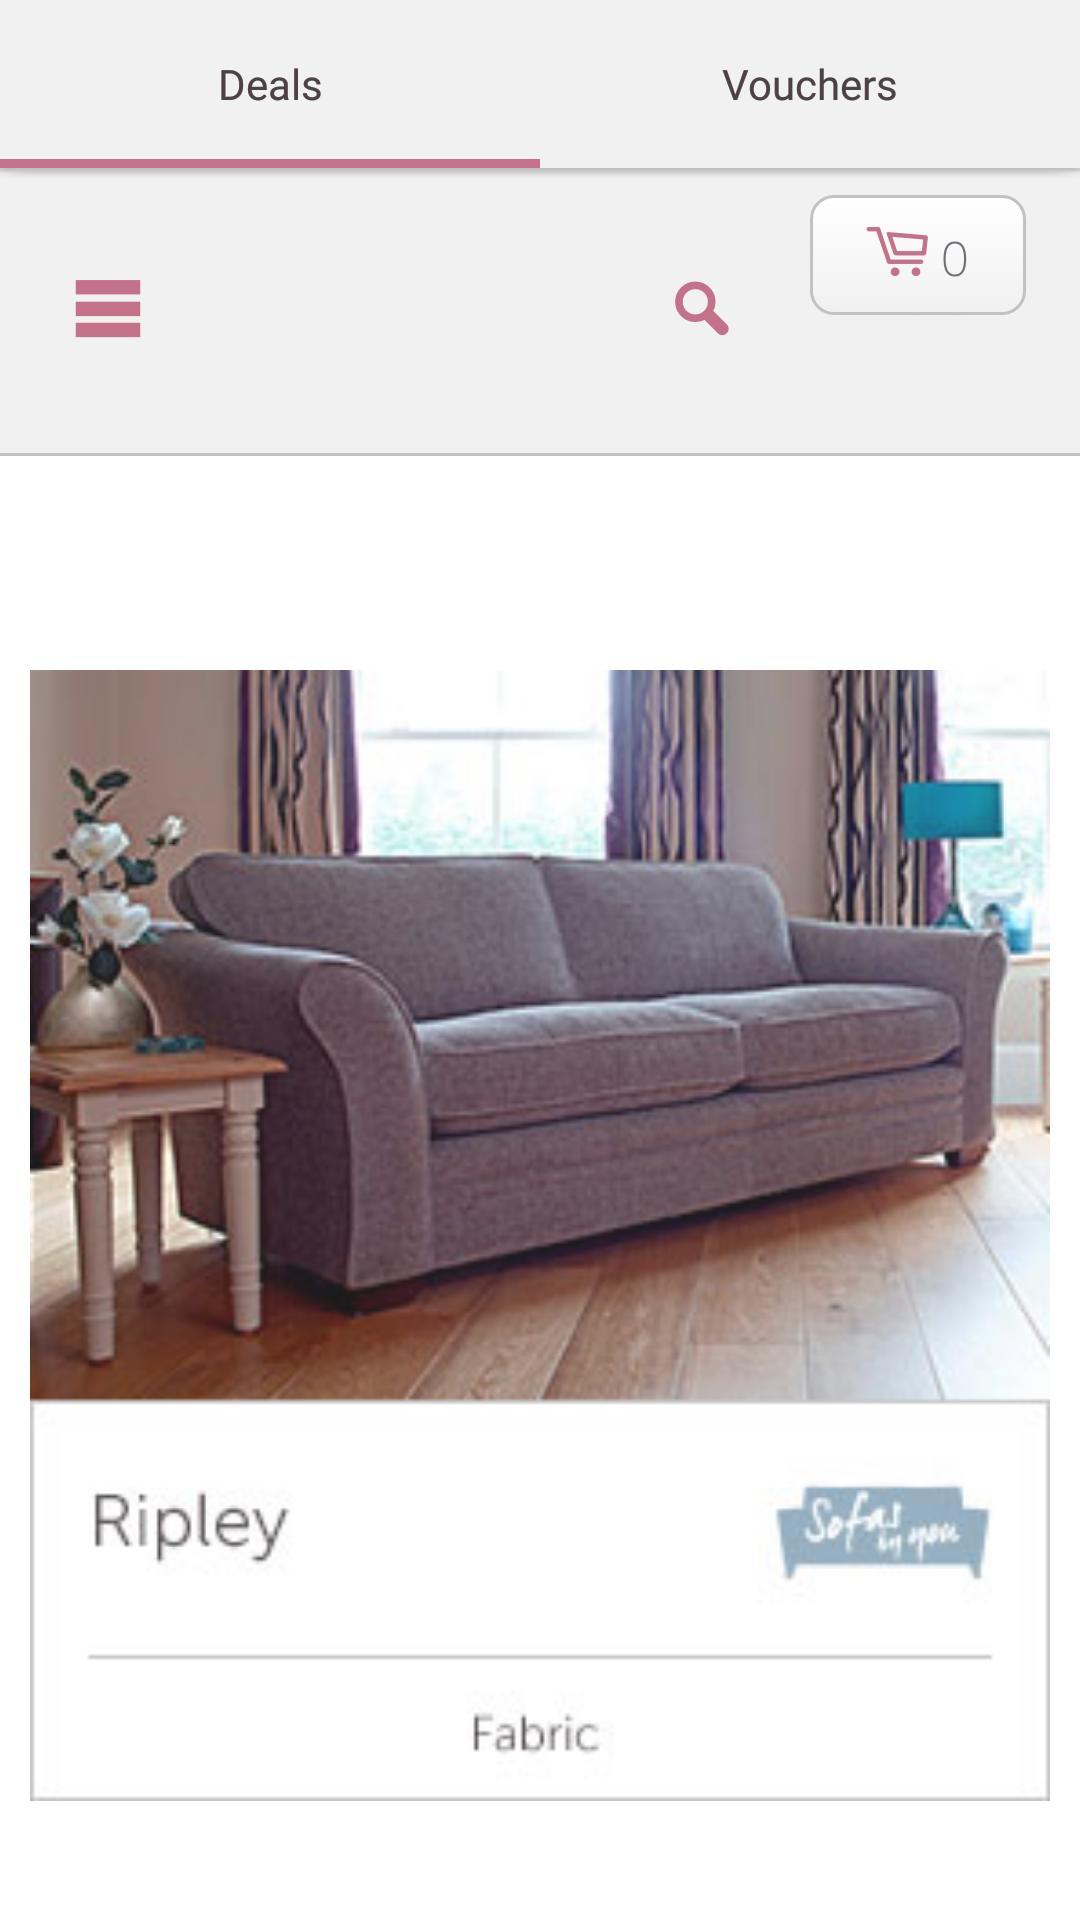 Deals For Harveys Furniture Android